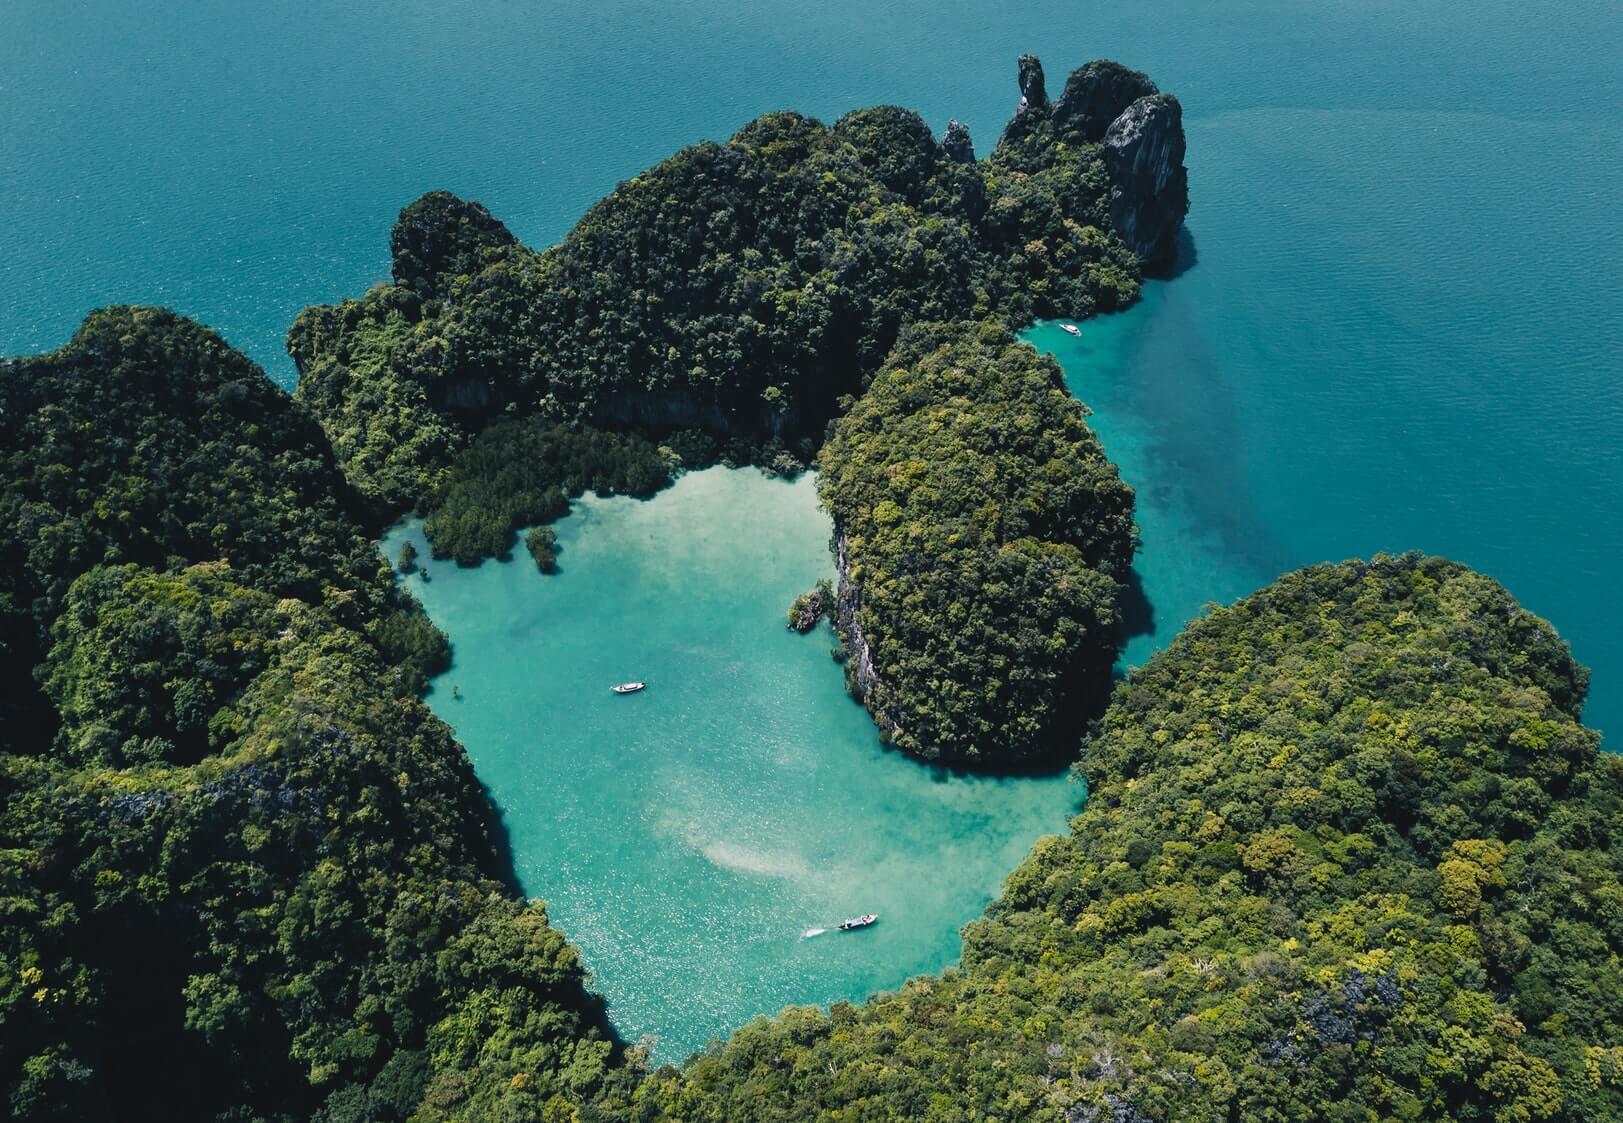 Для тех, кто не любит пакеты: небанальные маршруты по Таиланду